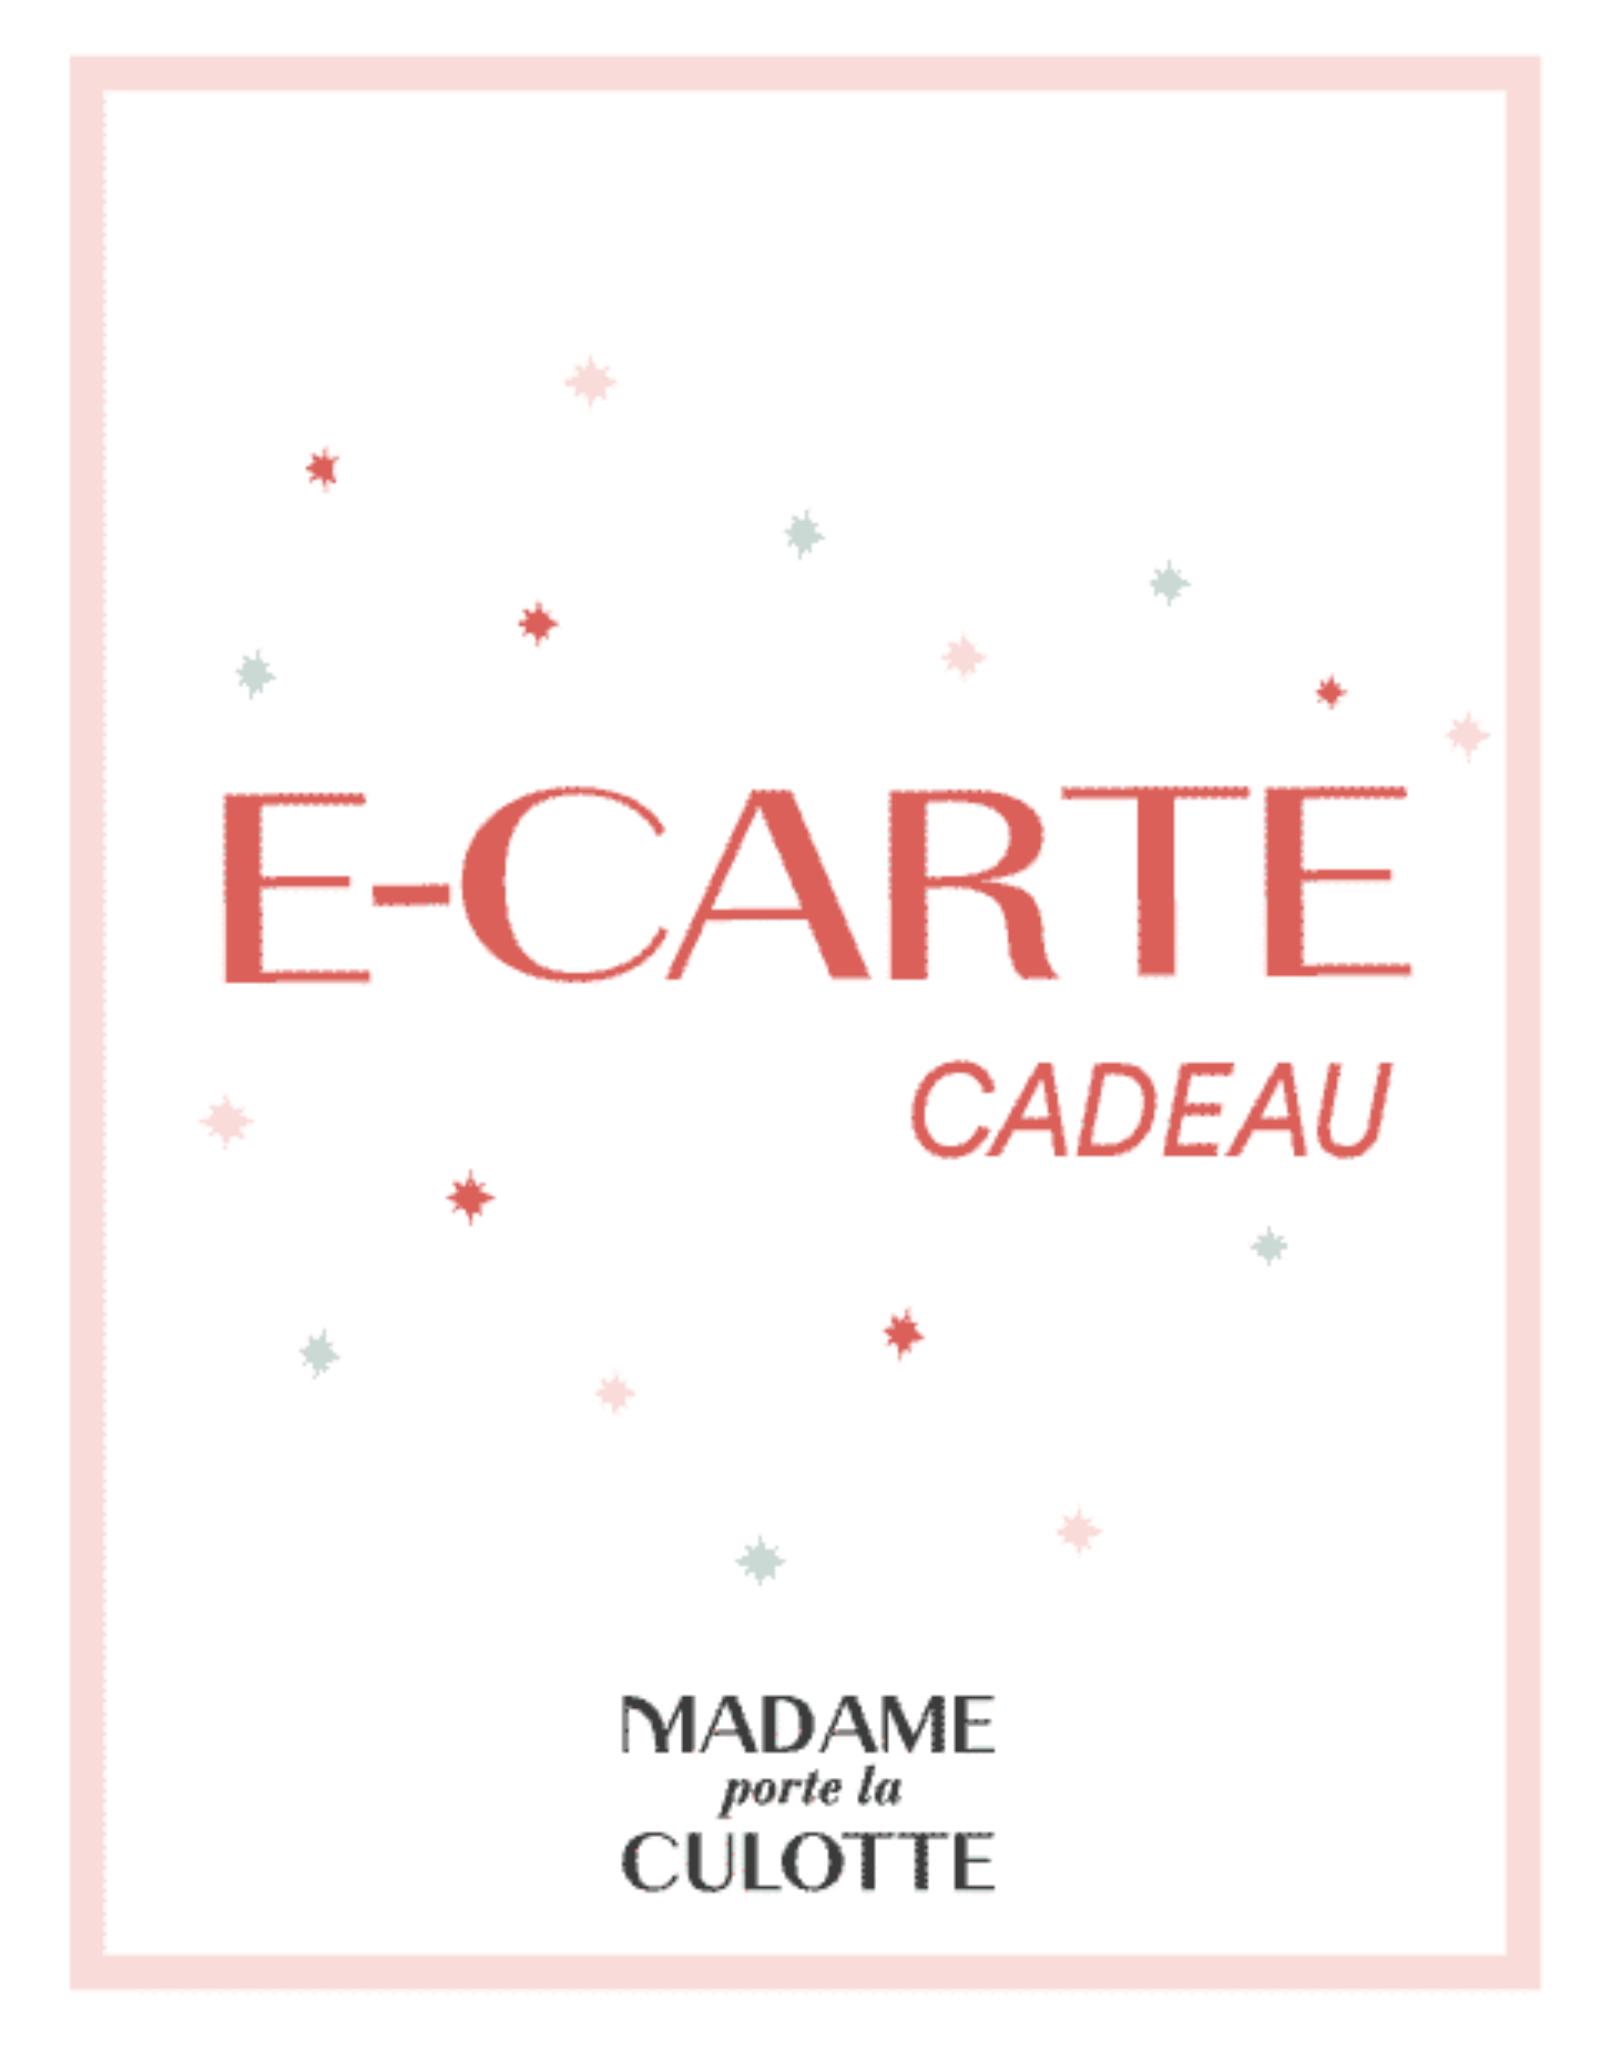 E-Carte Cadeau Madame porte la culotte